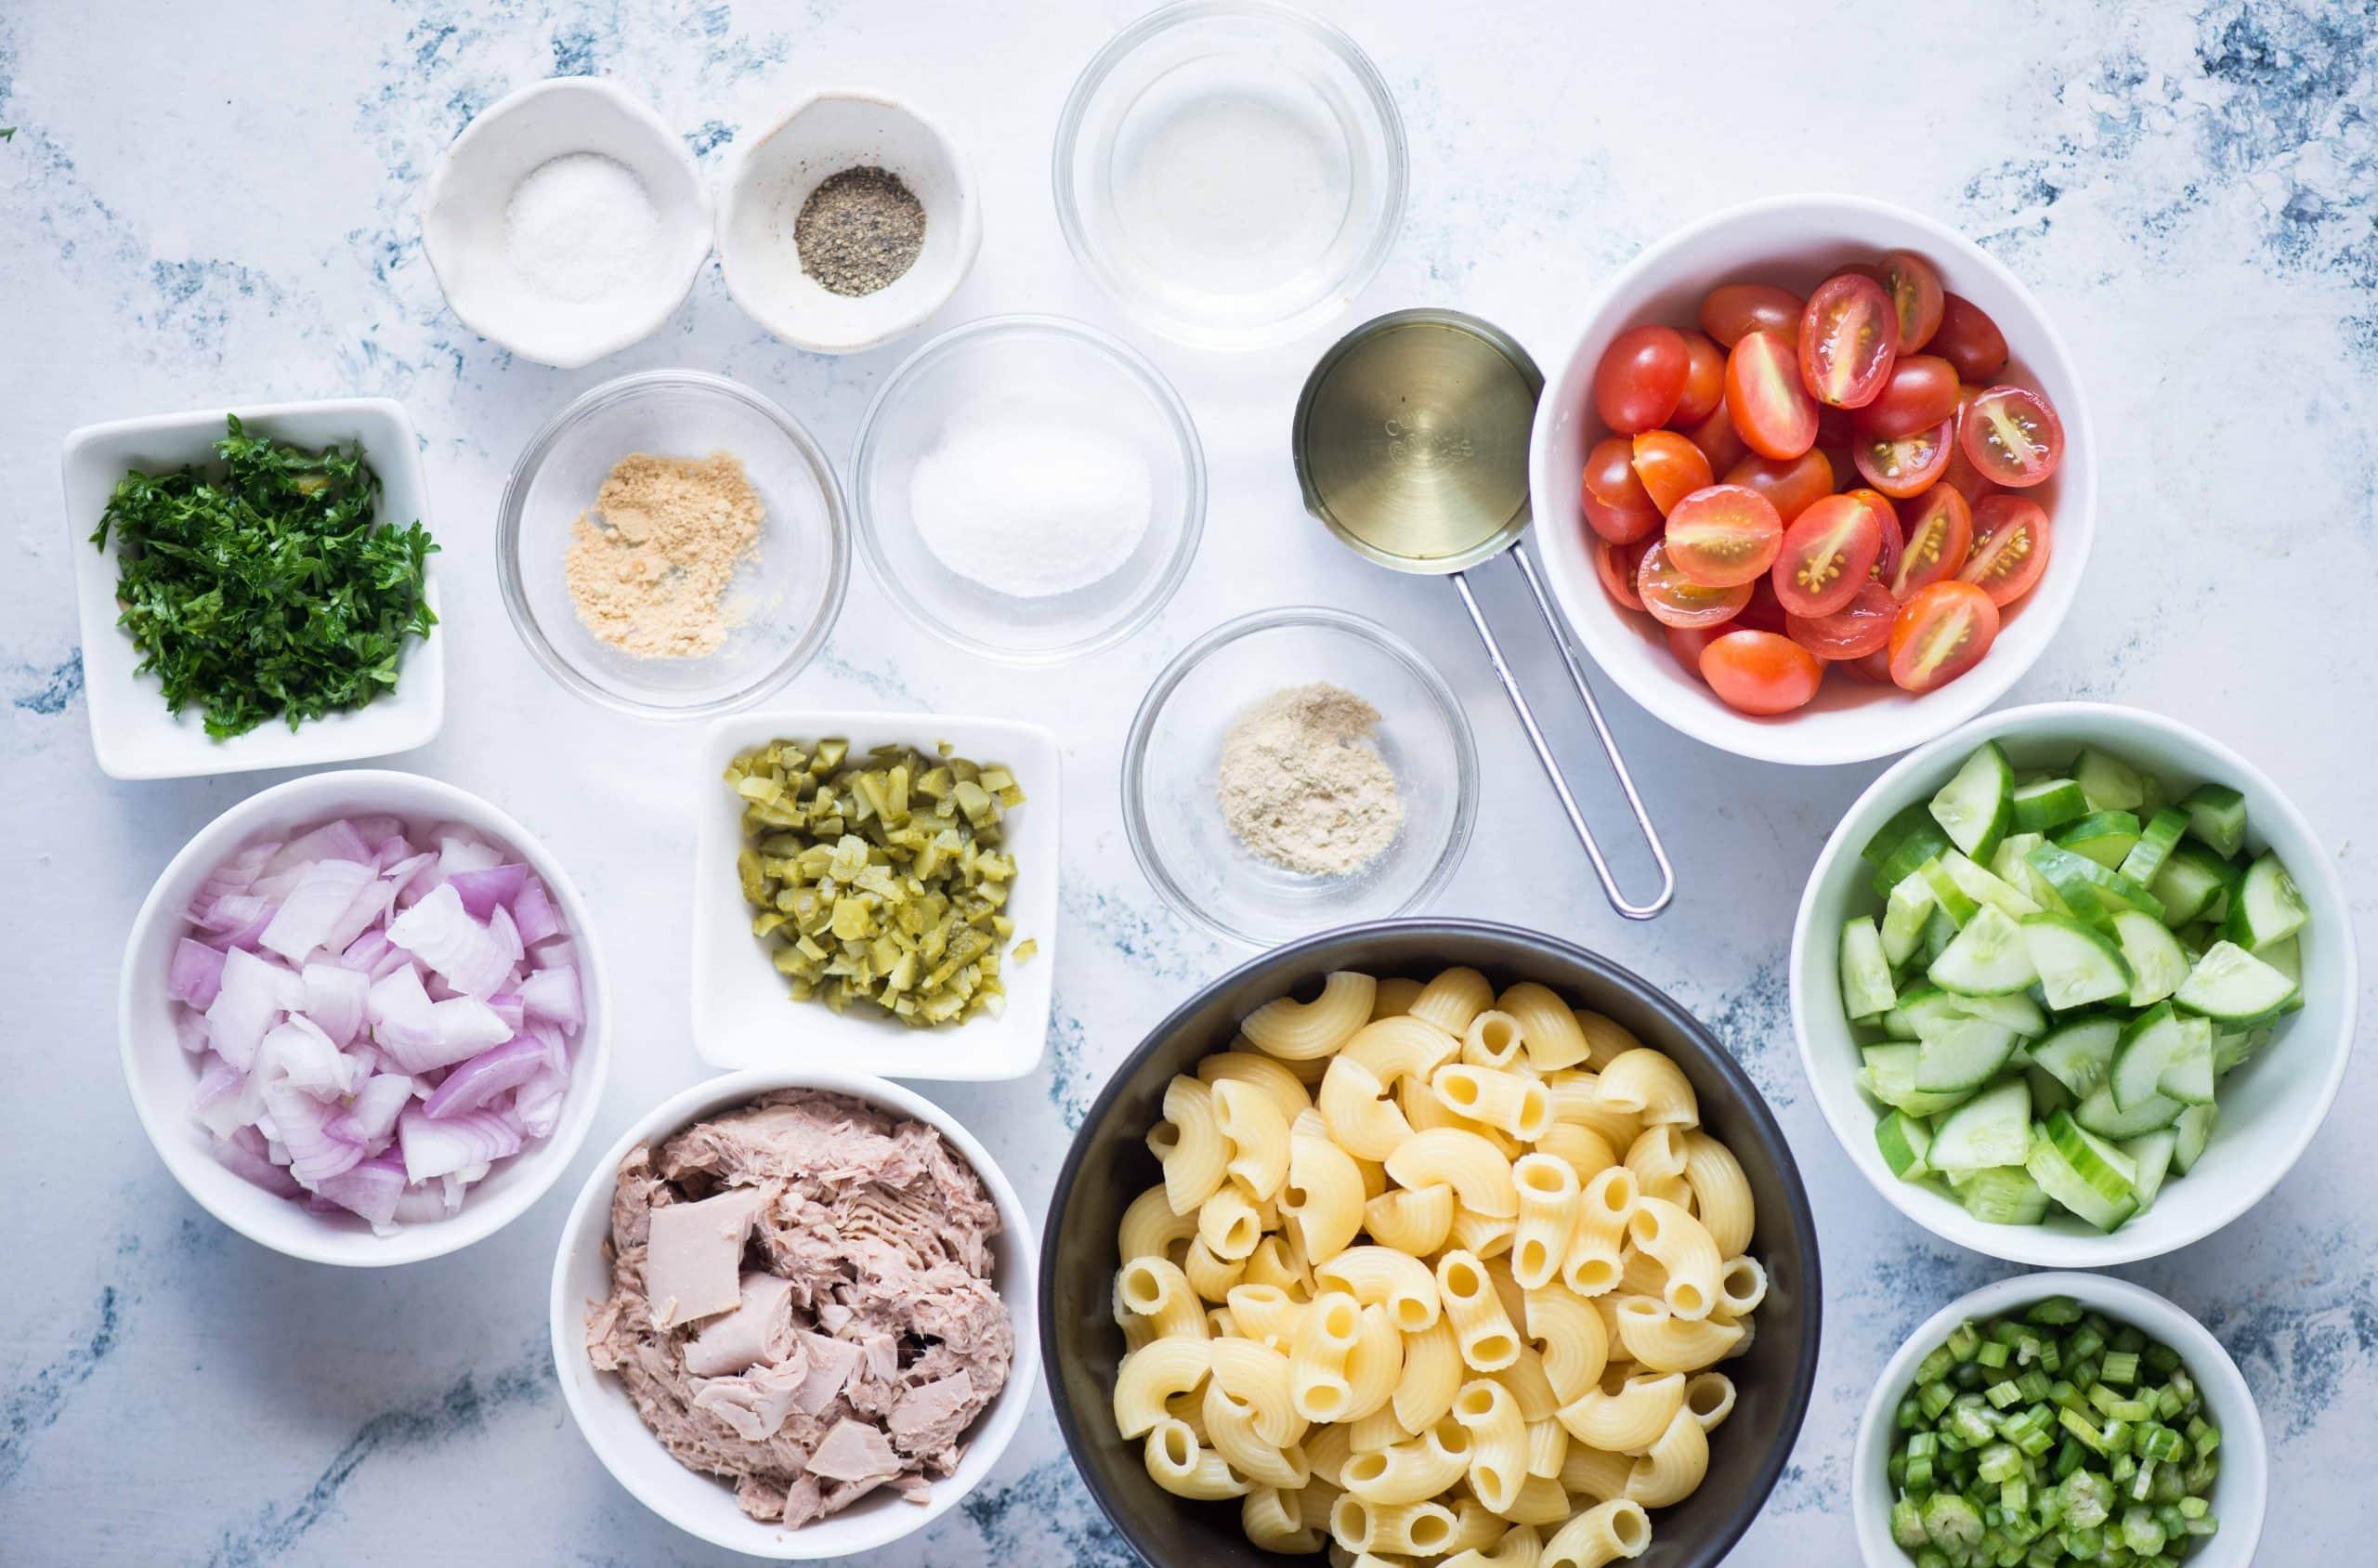 Ingredients for Tuna Pasta Salad